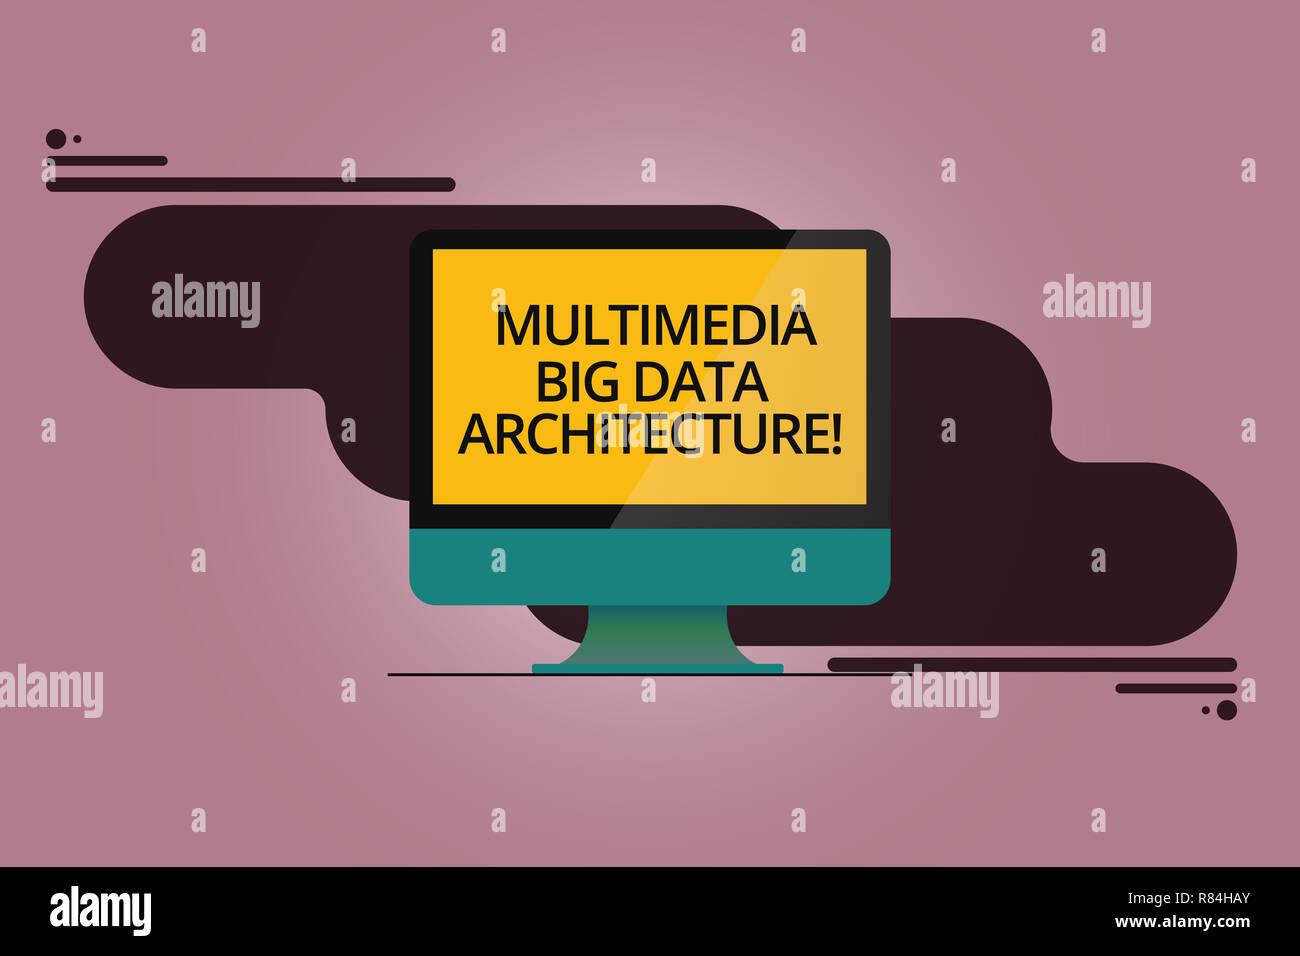 Analytics Big Data Architecture Stock Photos & Analytics Big